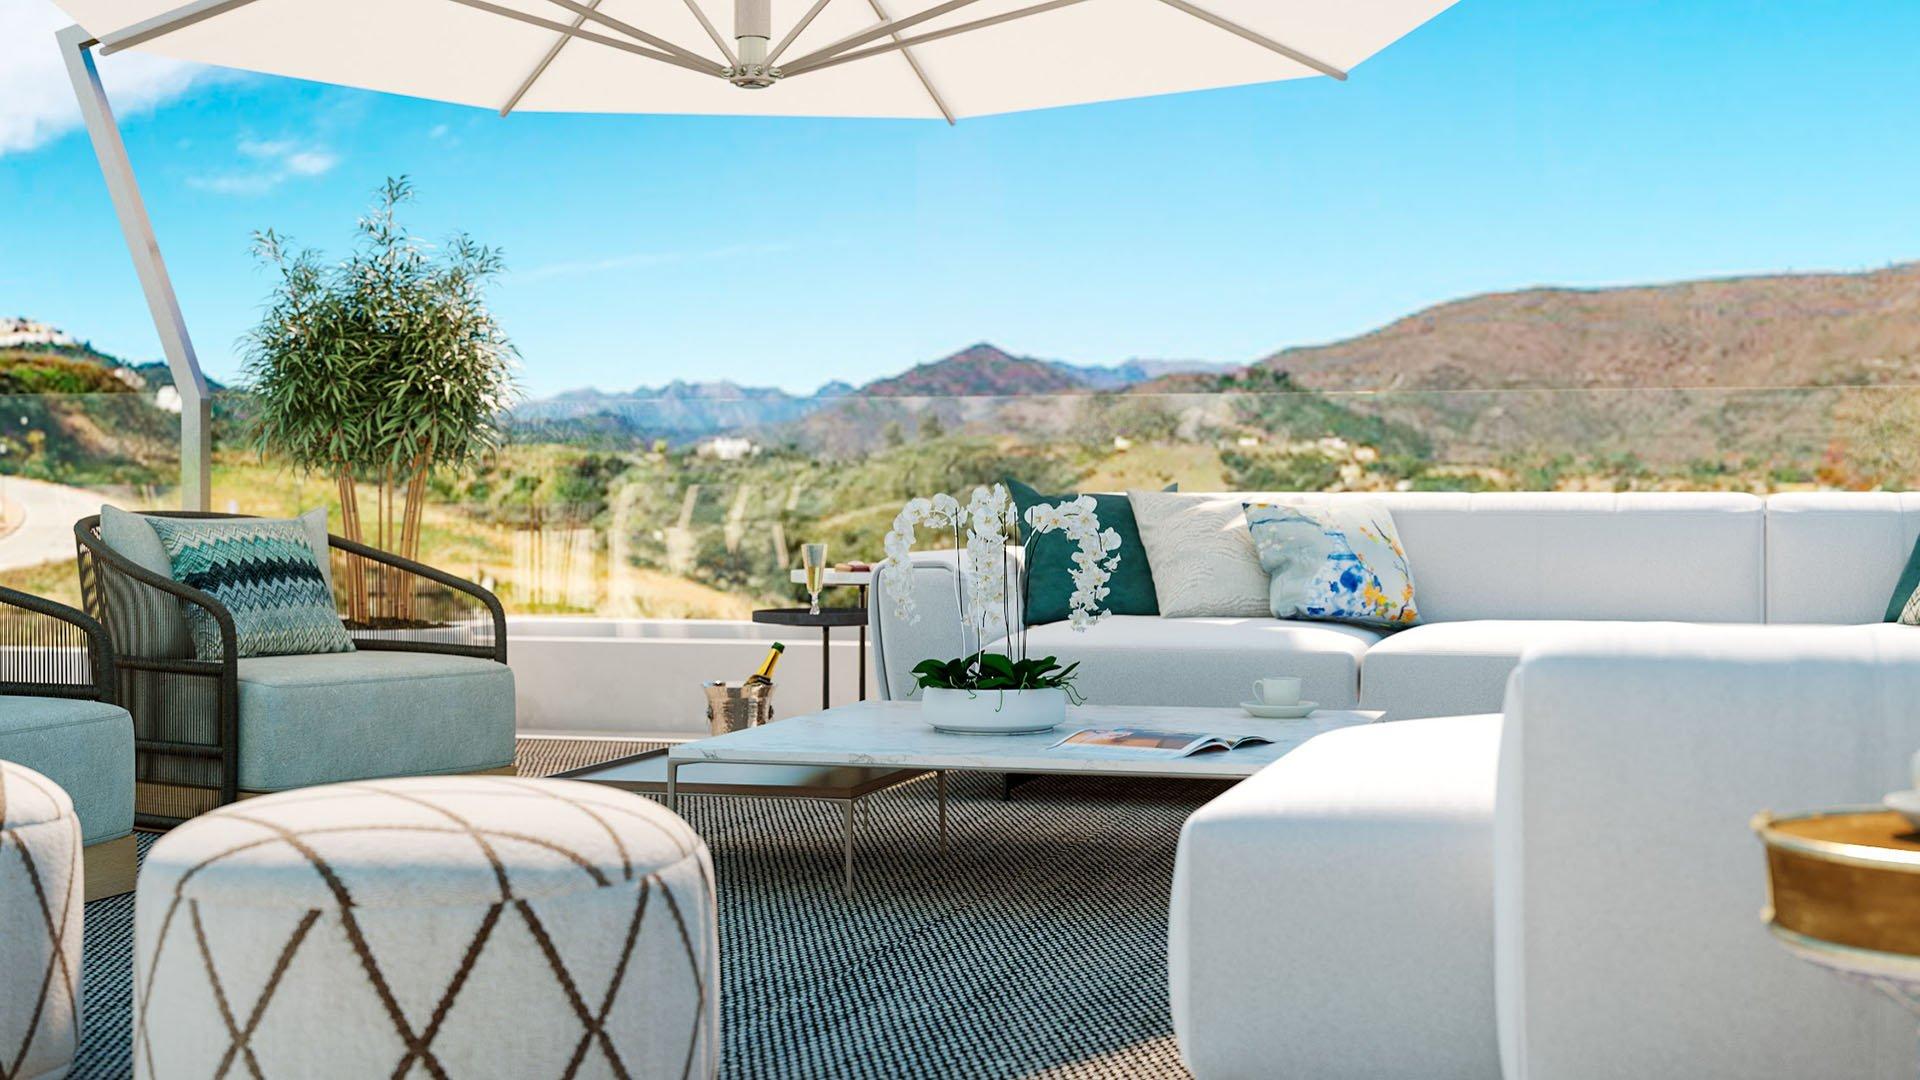 Elysium Golf: Exclusive villas in the idyllic countryside of La Cala Golf